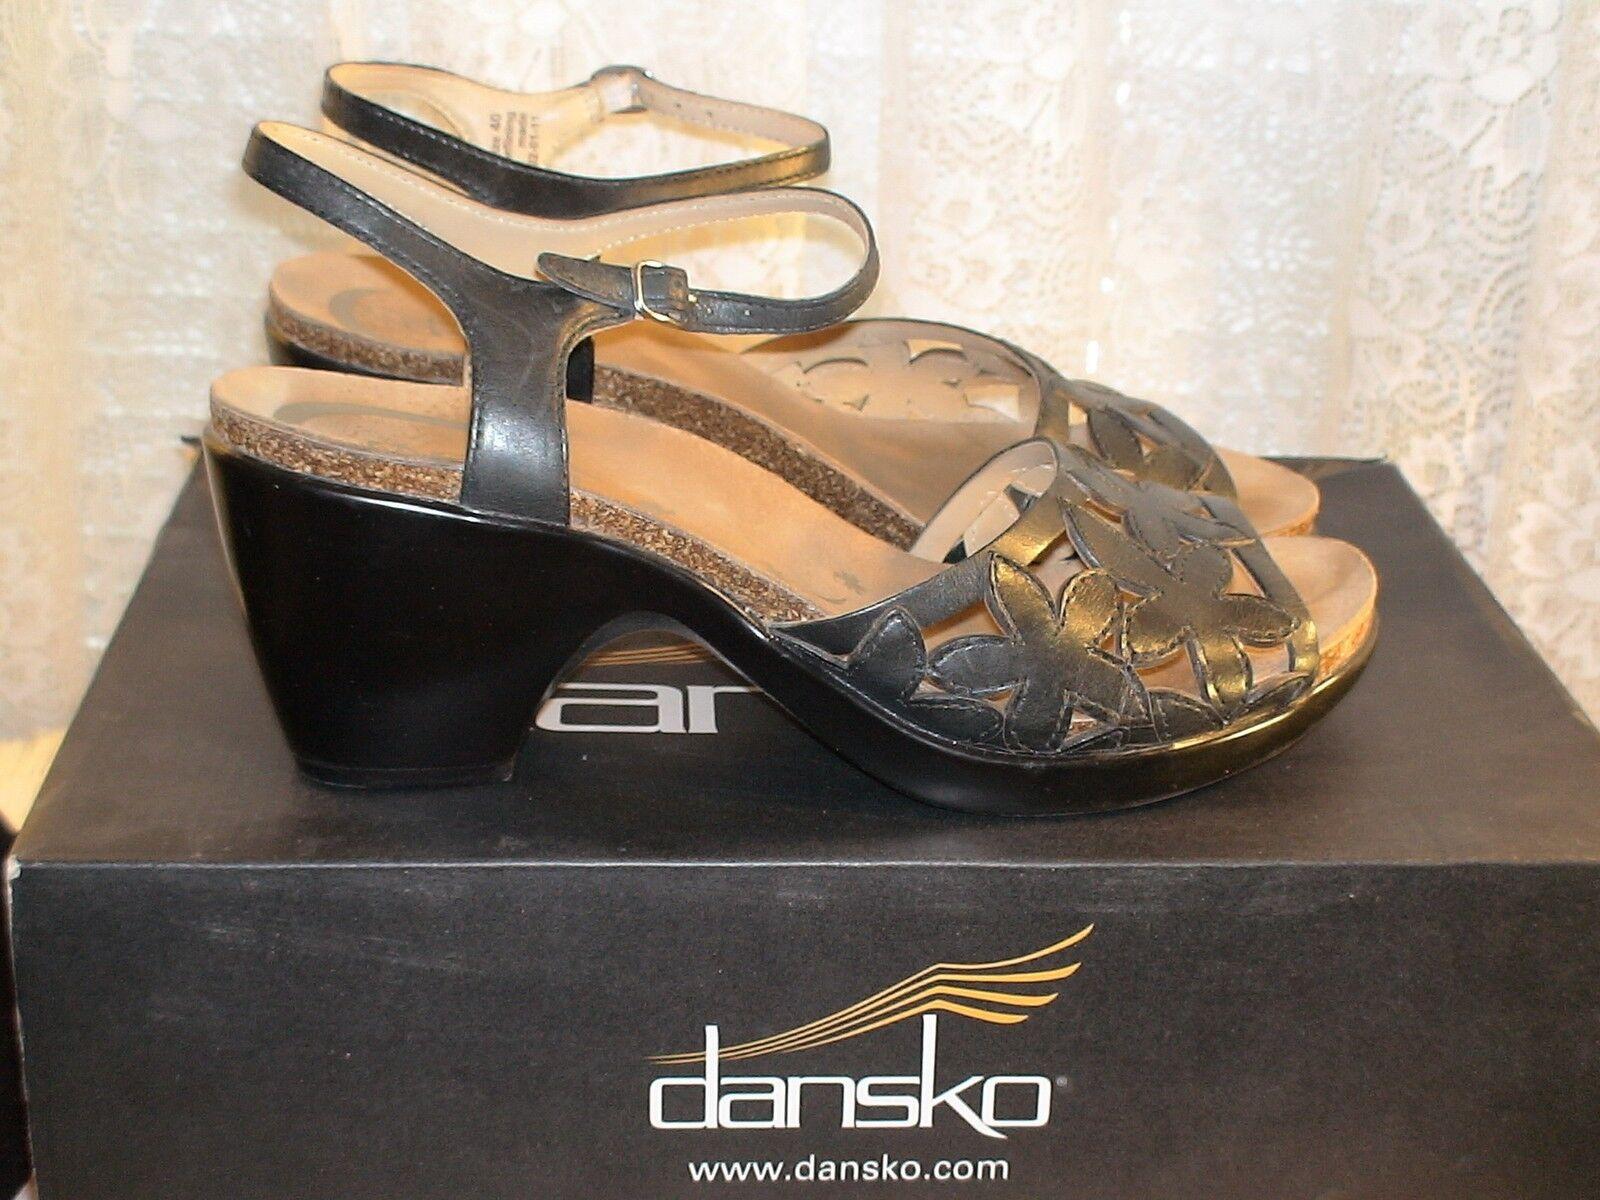 DANSKO COQUETTE FULL GRAIN BLACK SANDALS SZ 40 NIB